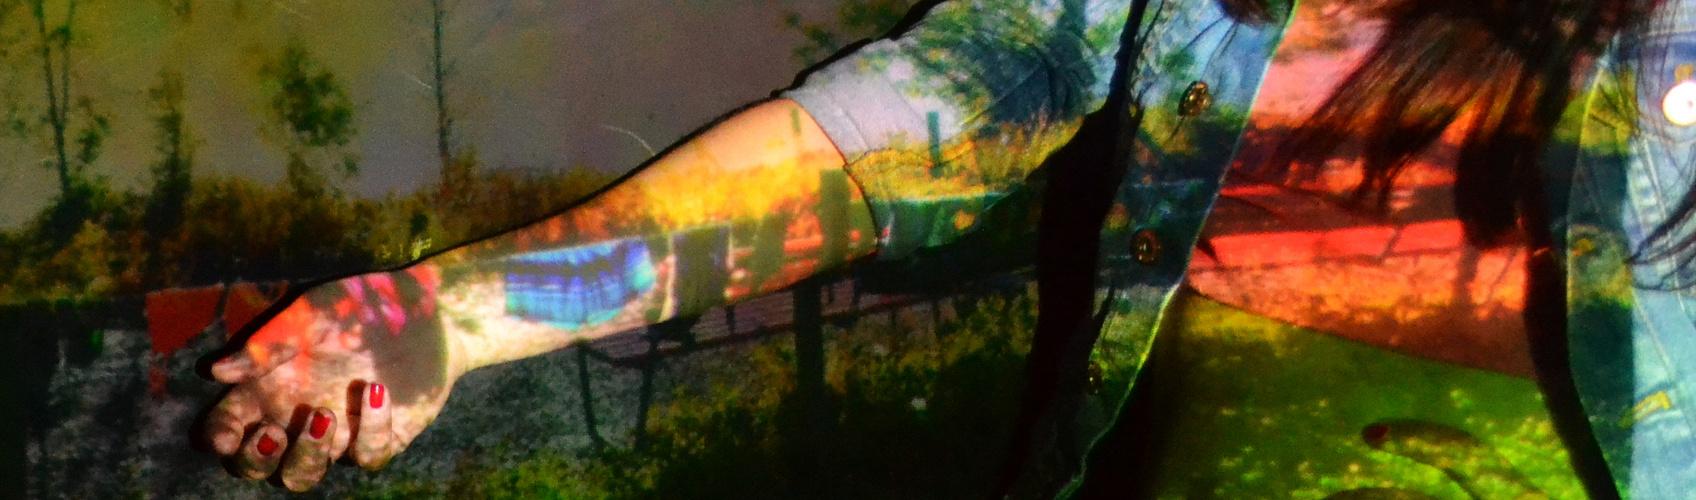 projectionart-summer